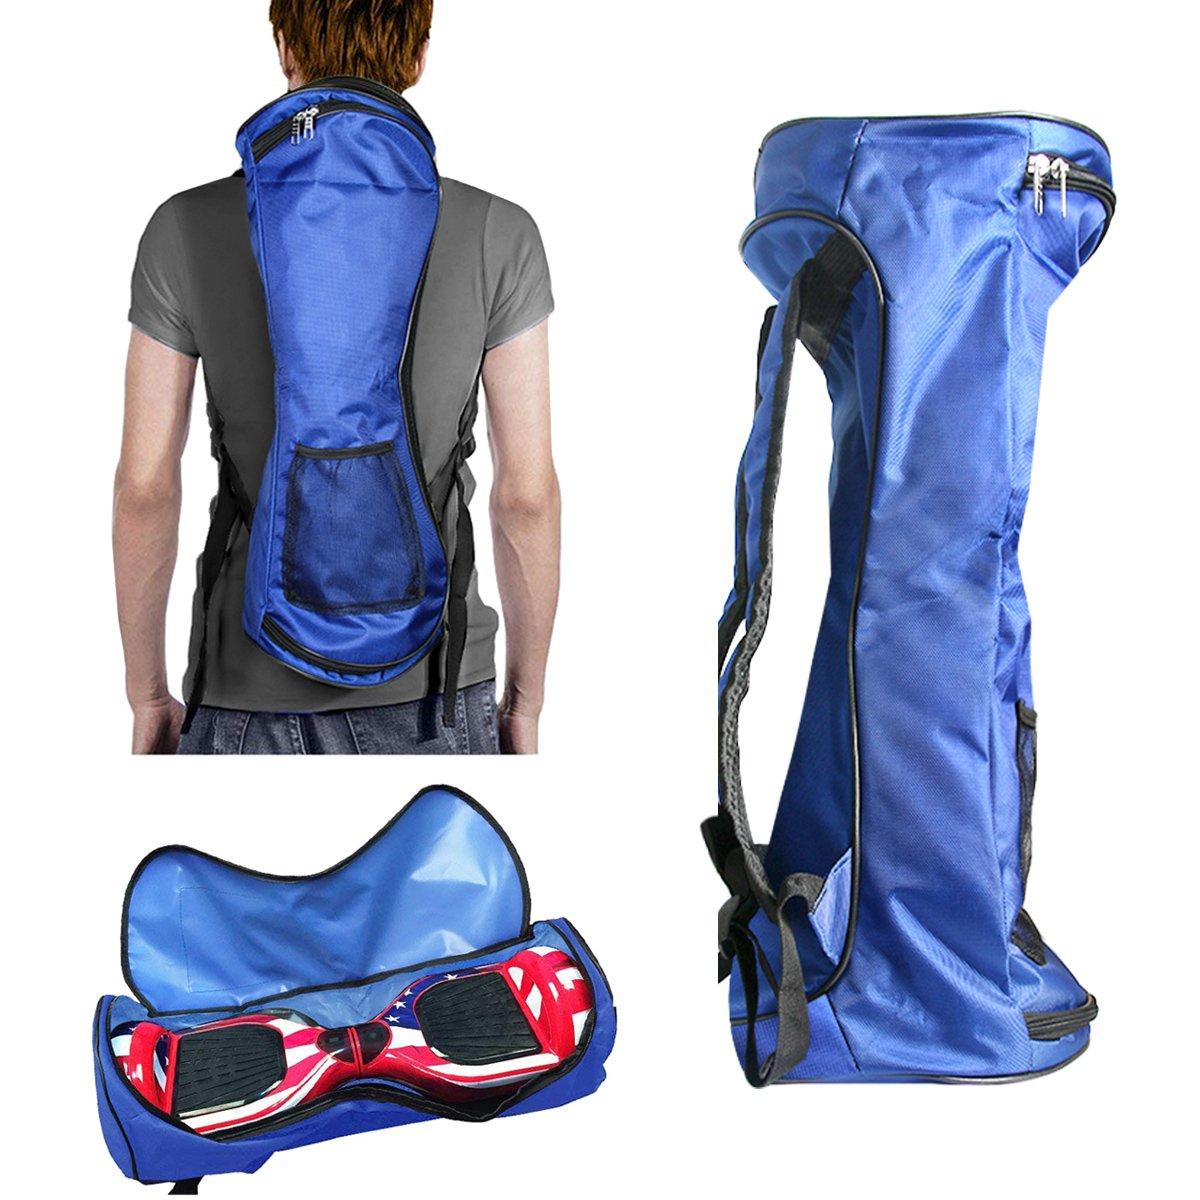 GameXcel Self-Balancing Scooter Carrying Backpack Bag for 6.5'' 7'' and 8'' Two-Wheel Hover Electric Skate Board Smart Balancing Scooters Storage Mesh Pocket Adjustable Shoulder Strap Blue